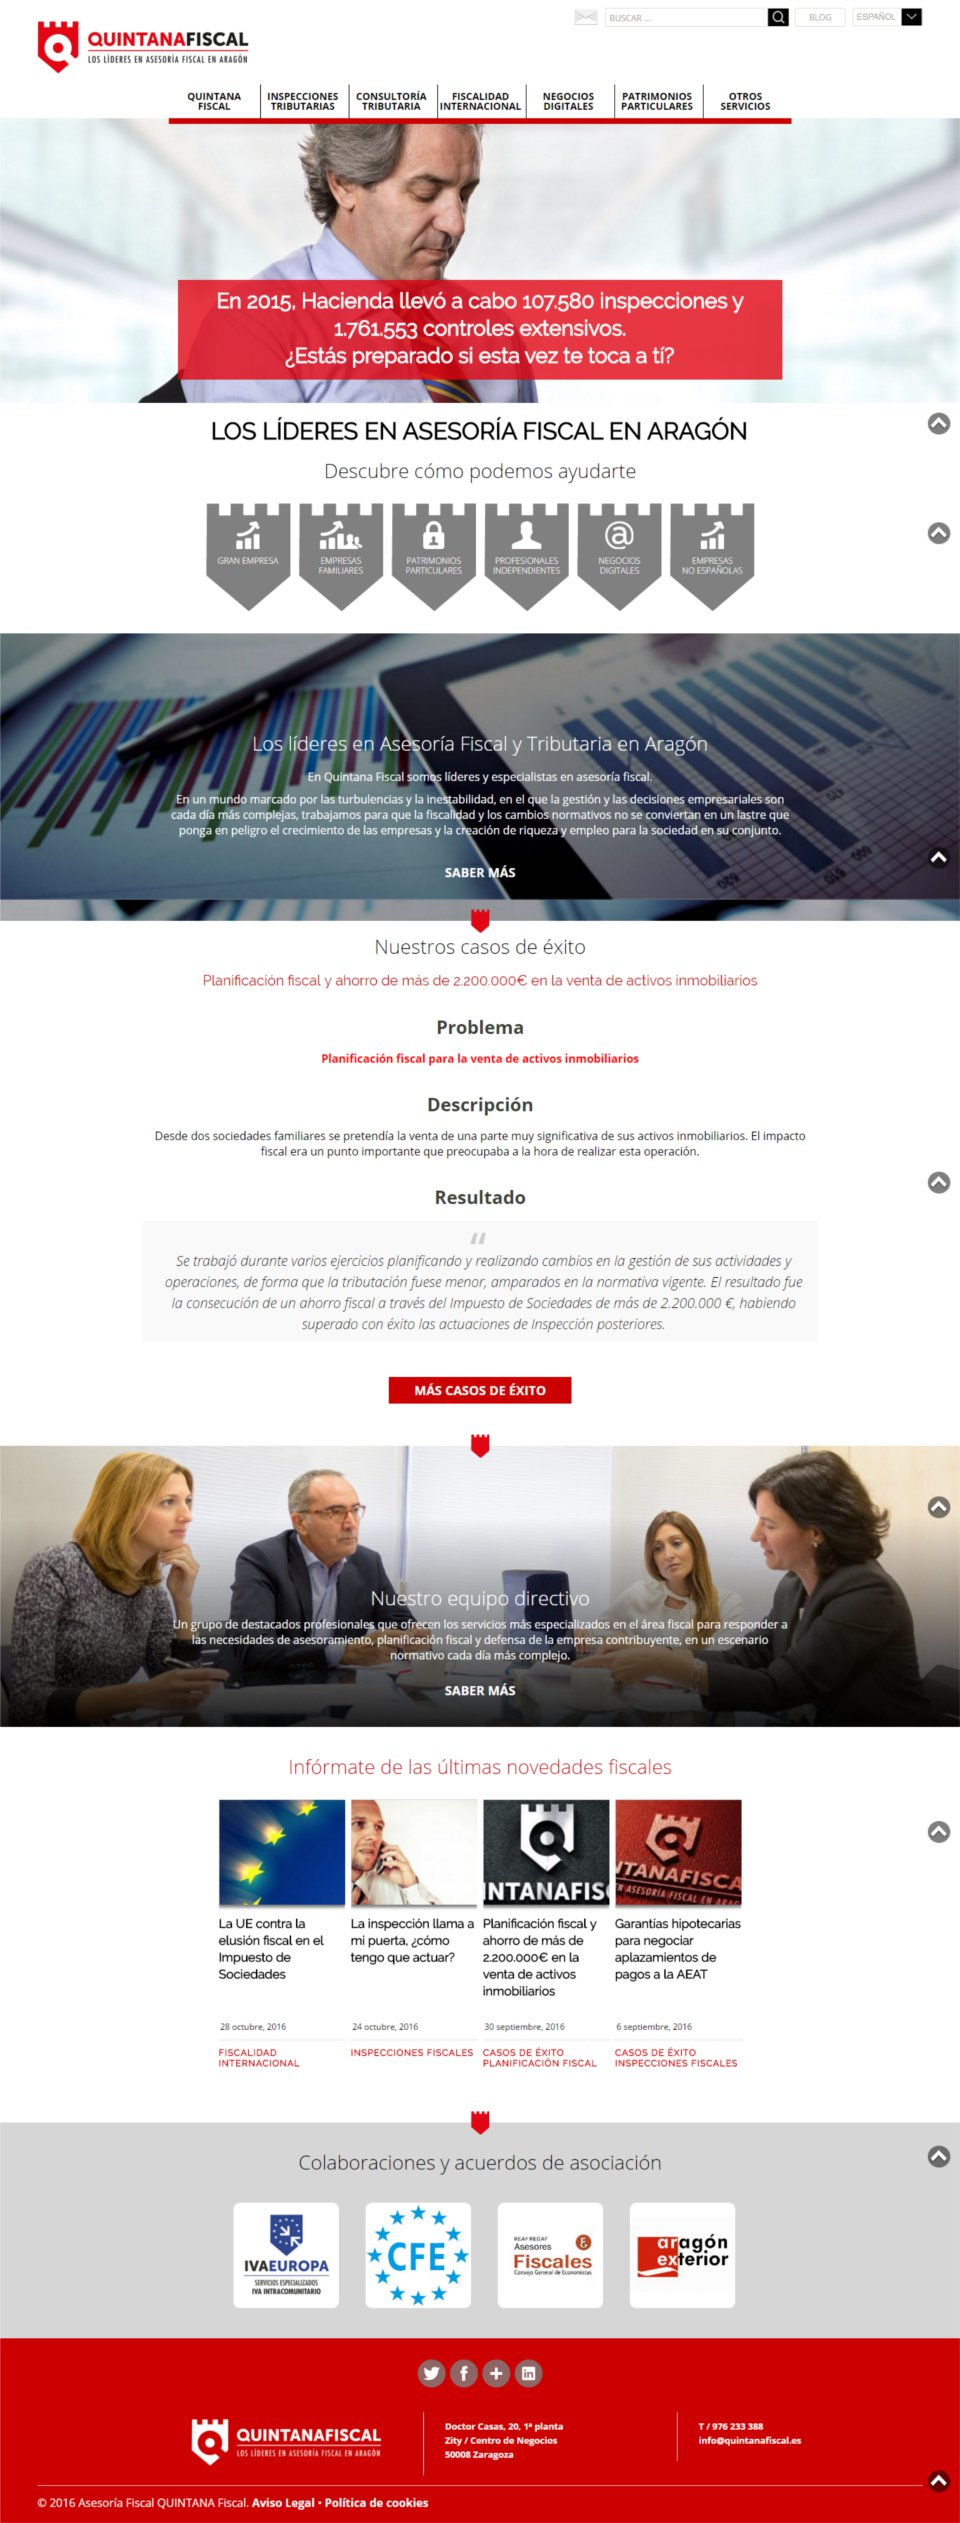 Mejora Competitiva. Reinvención Empresarial. Quintana Fiscal. Web